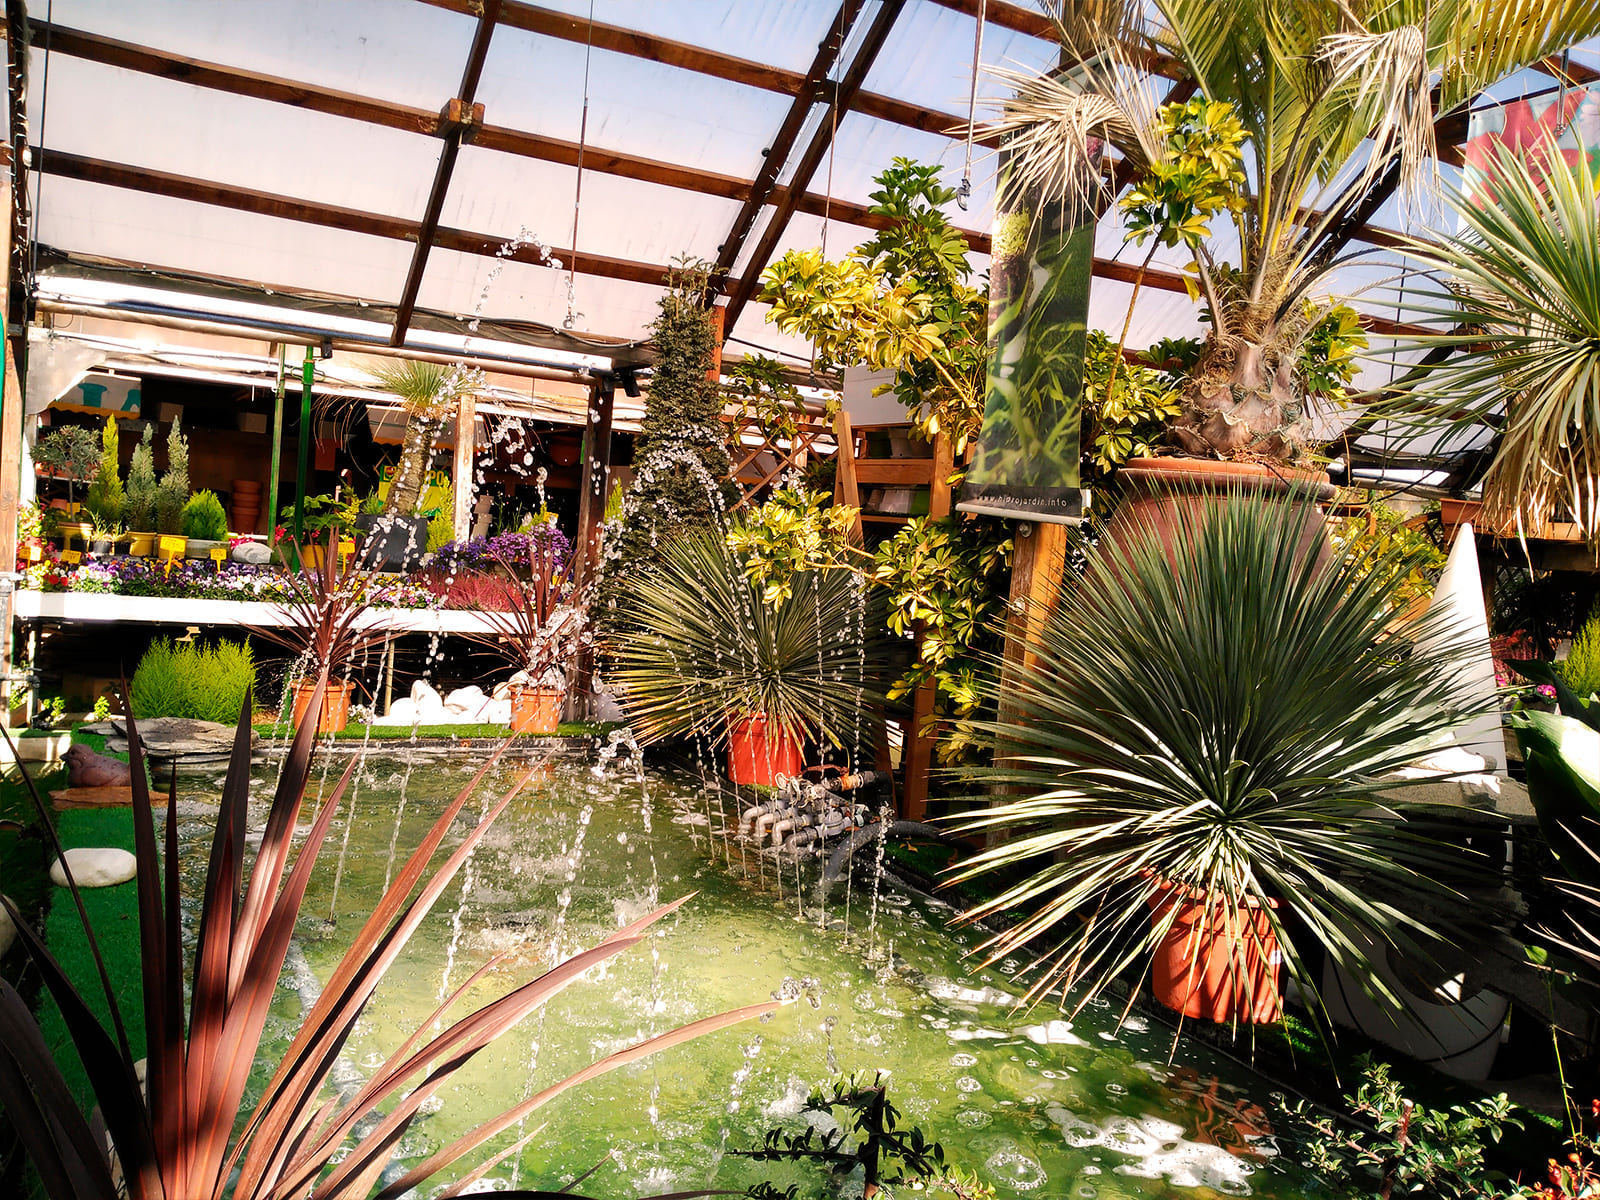 centro-jardineria-garden-invernadero-artesanal-madera-fuente-05_HIDROJARDIN-Bañeres